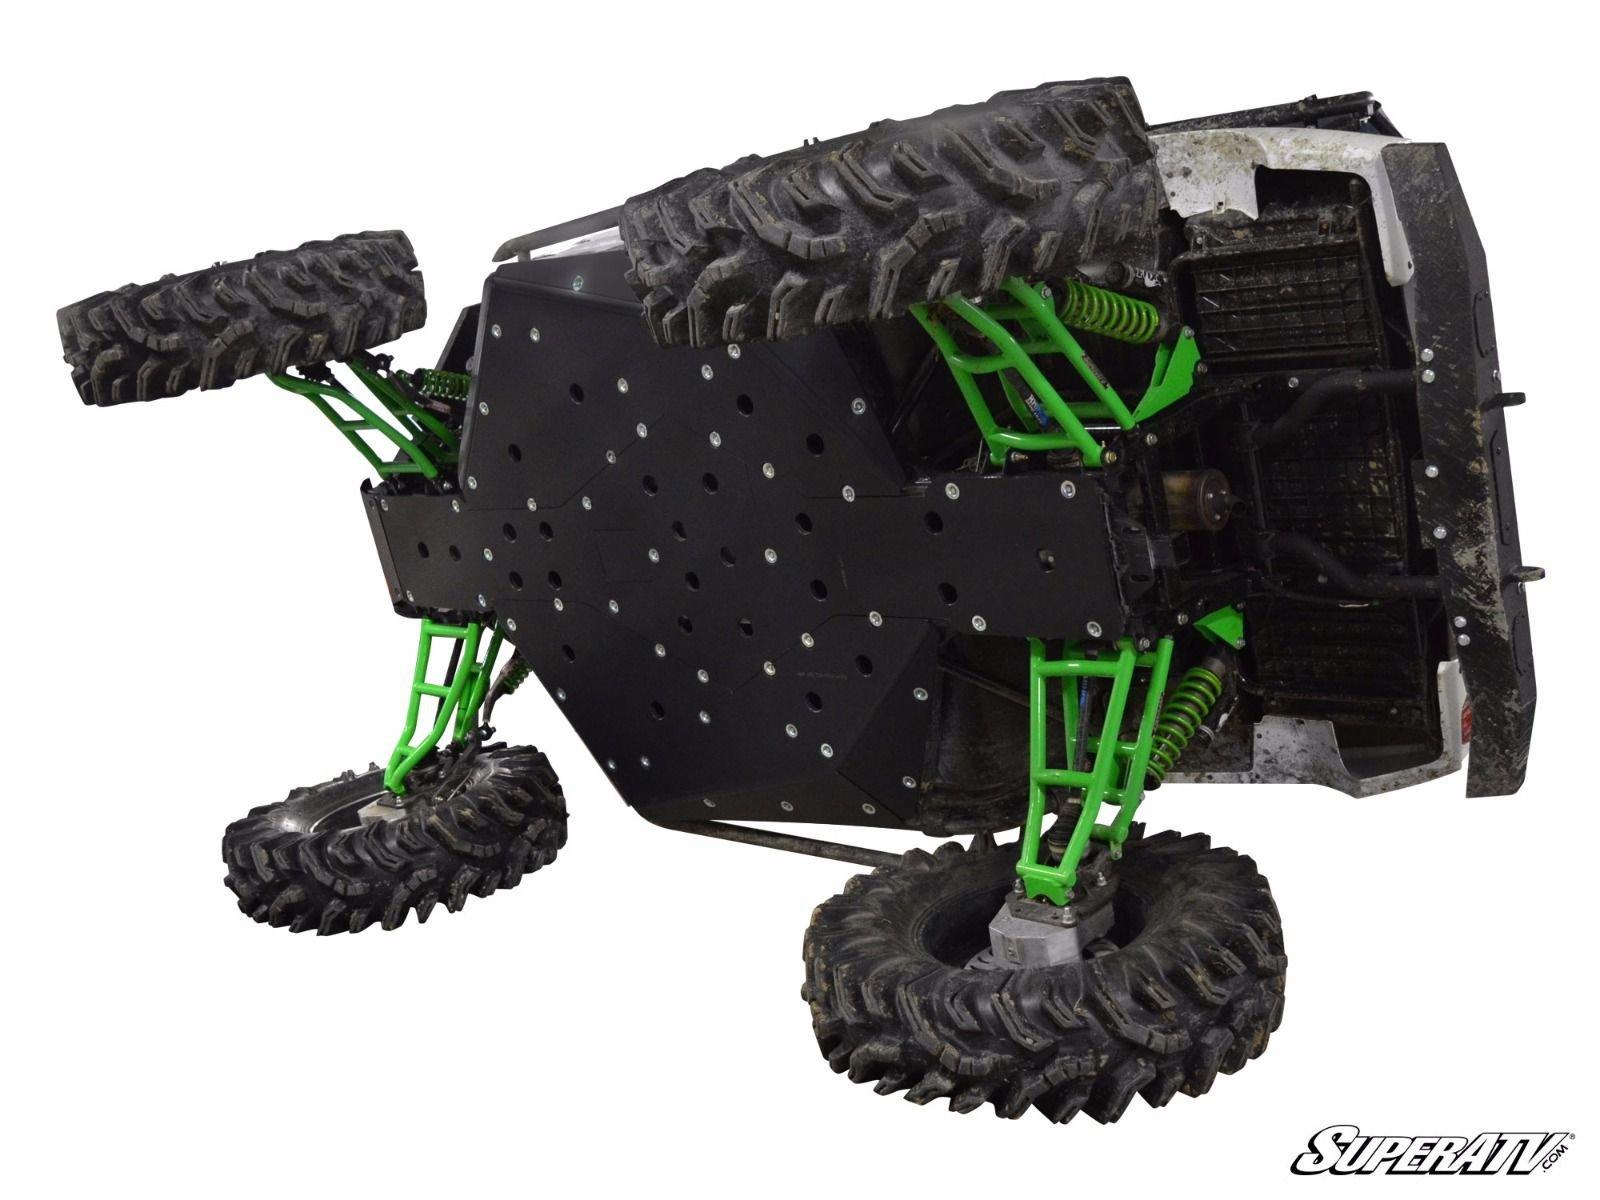 Bundle 2 items:MADE IN USA!!! Super ATV Kawasaki Teryx Full Skid Plate & FREE Unhinged ATV HAT!